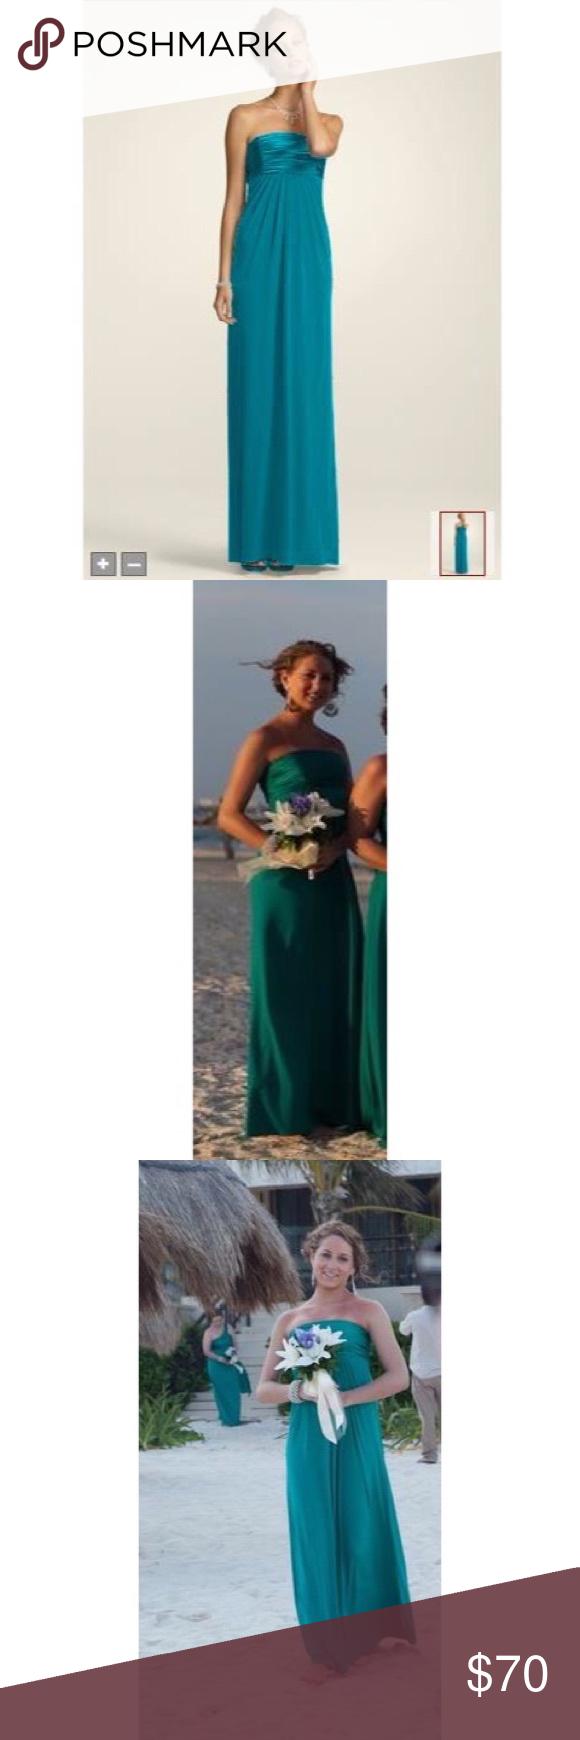 Davidus bridal jade bridesmaidprom dress